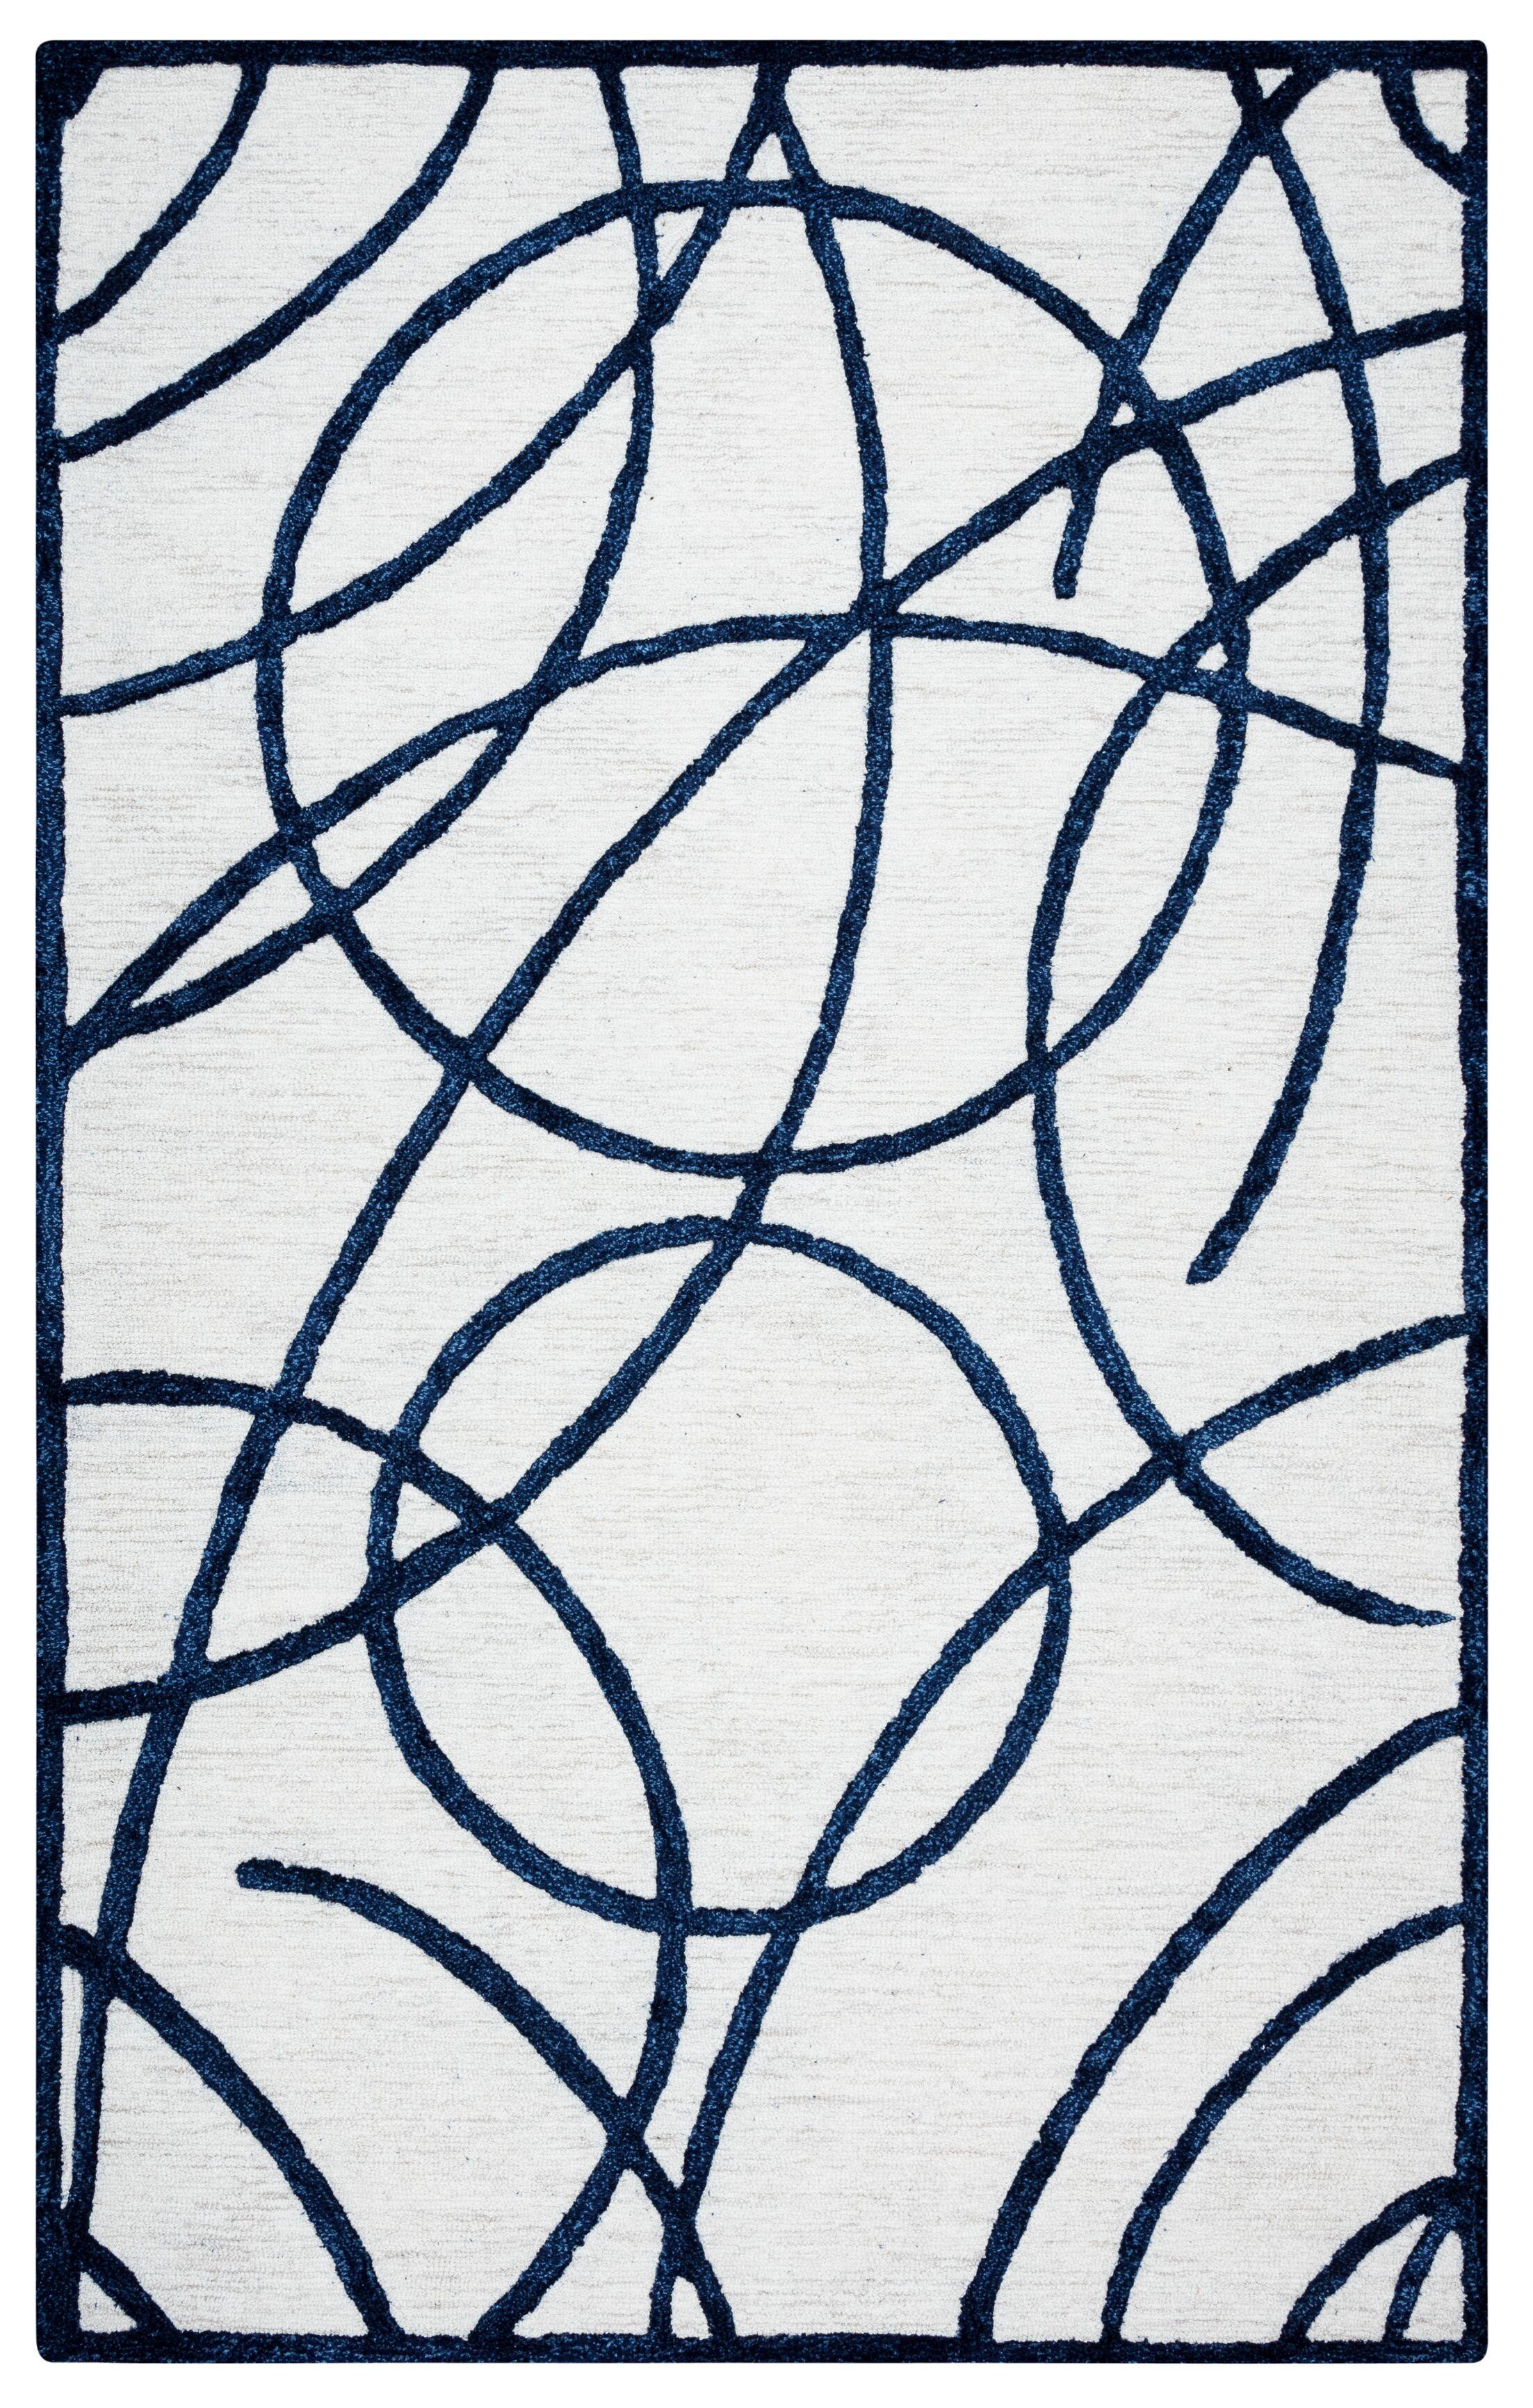 Climenhaga Hand-Tufted Off White/Black Area Rug Size: Rectangle 9' x 12'